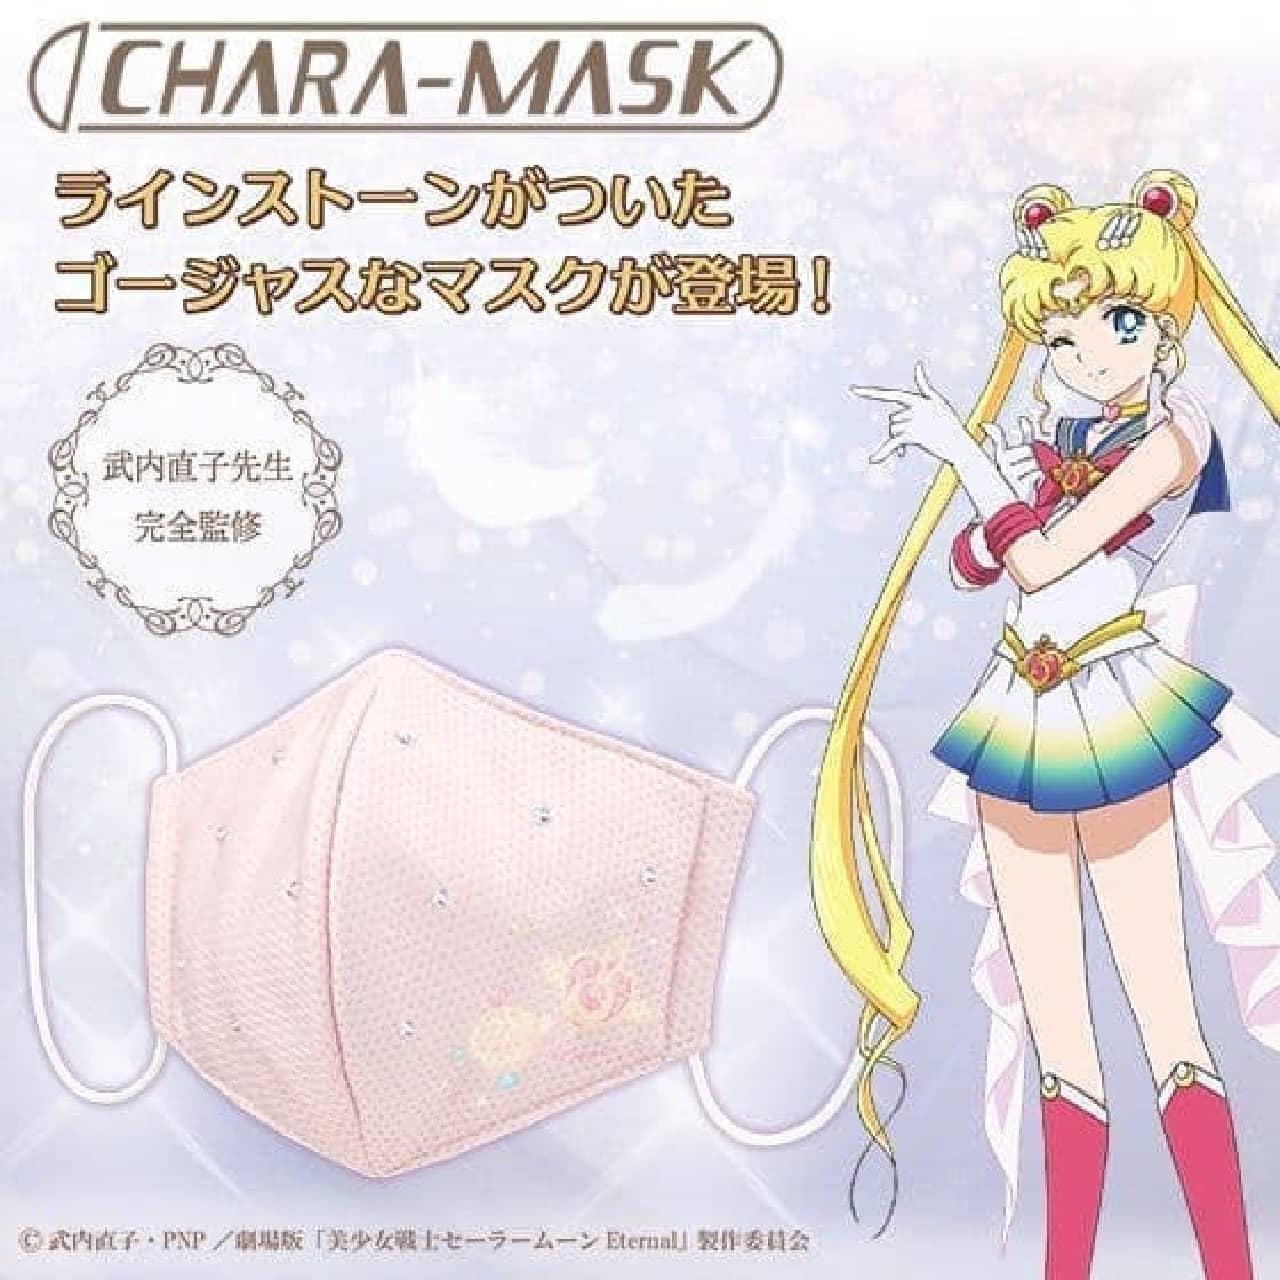 CHARA-MASK 劇場版「美少女戦士セーラームーンEternal」